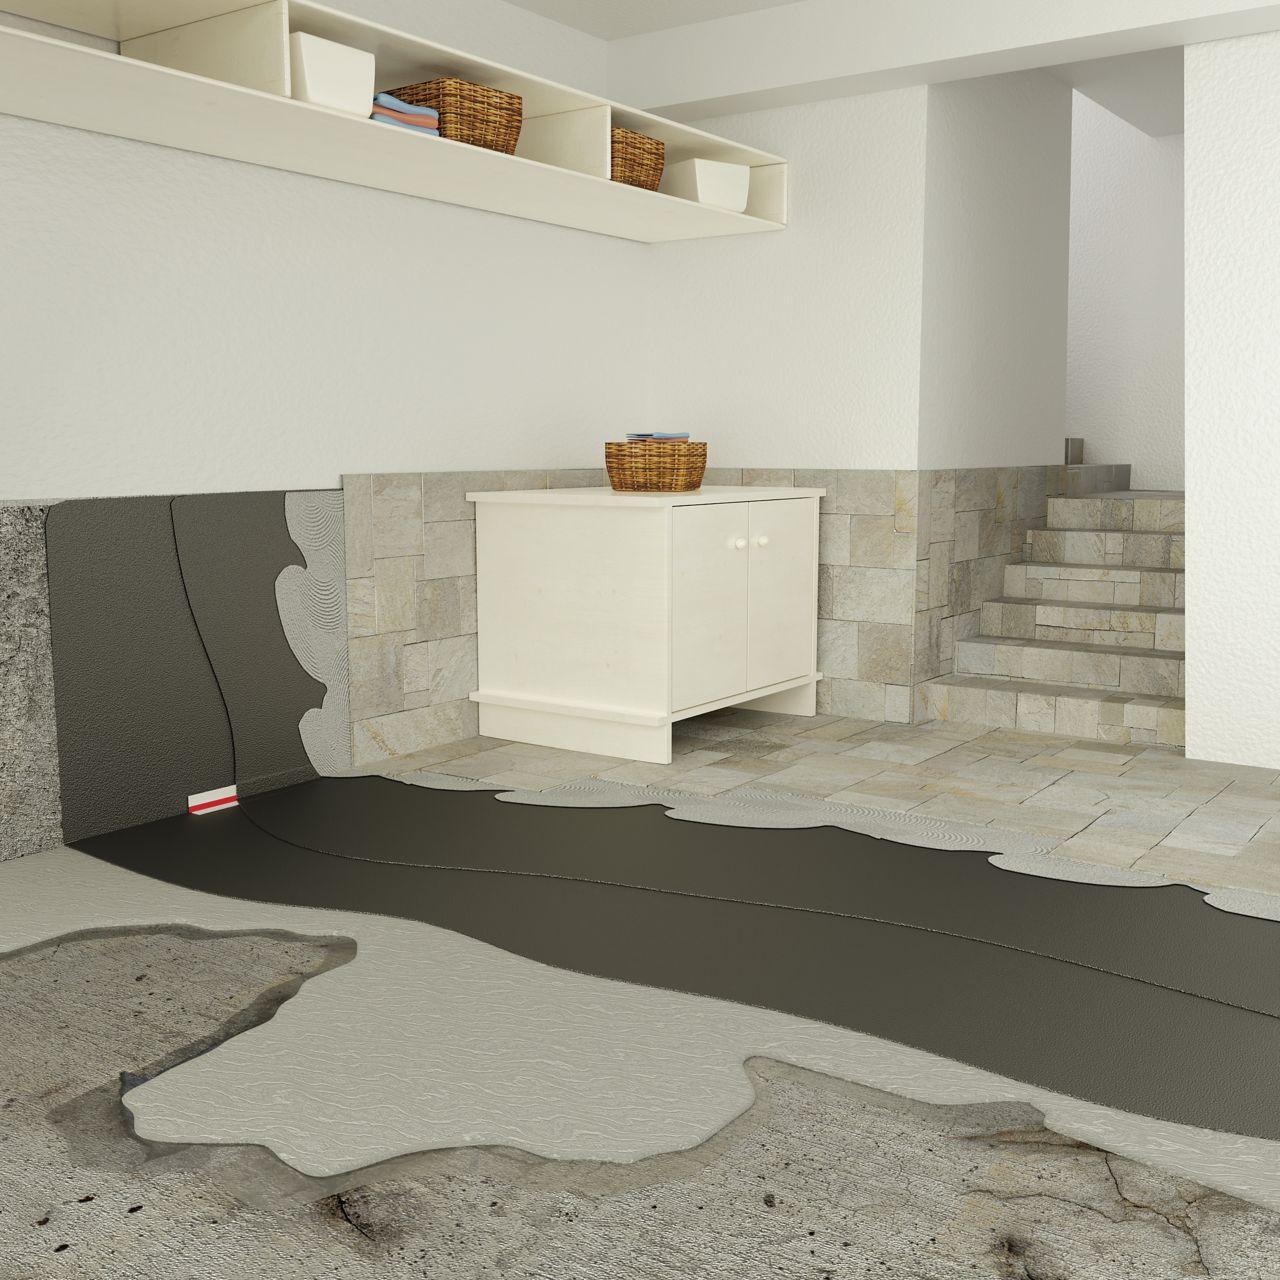 Waterproofing of internal basement walls